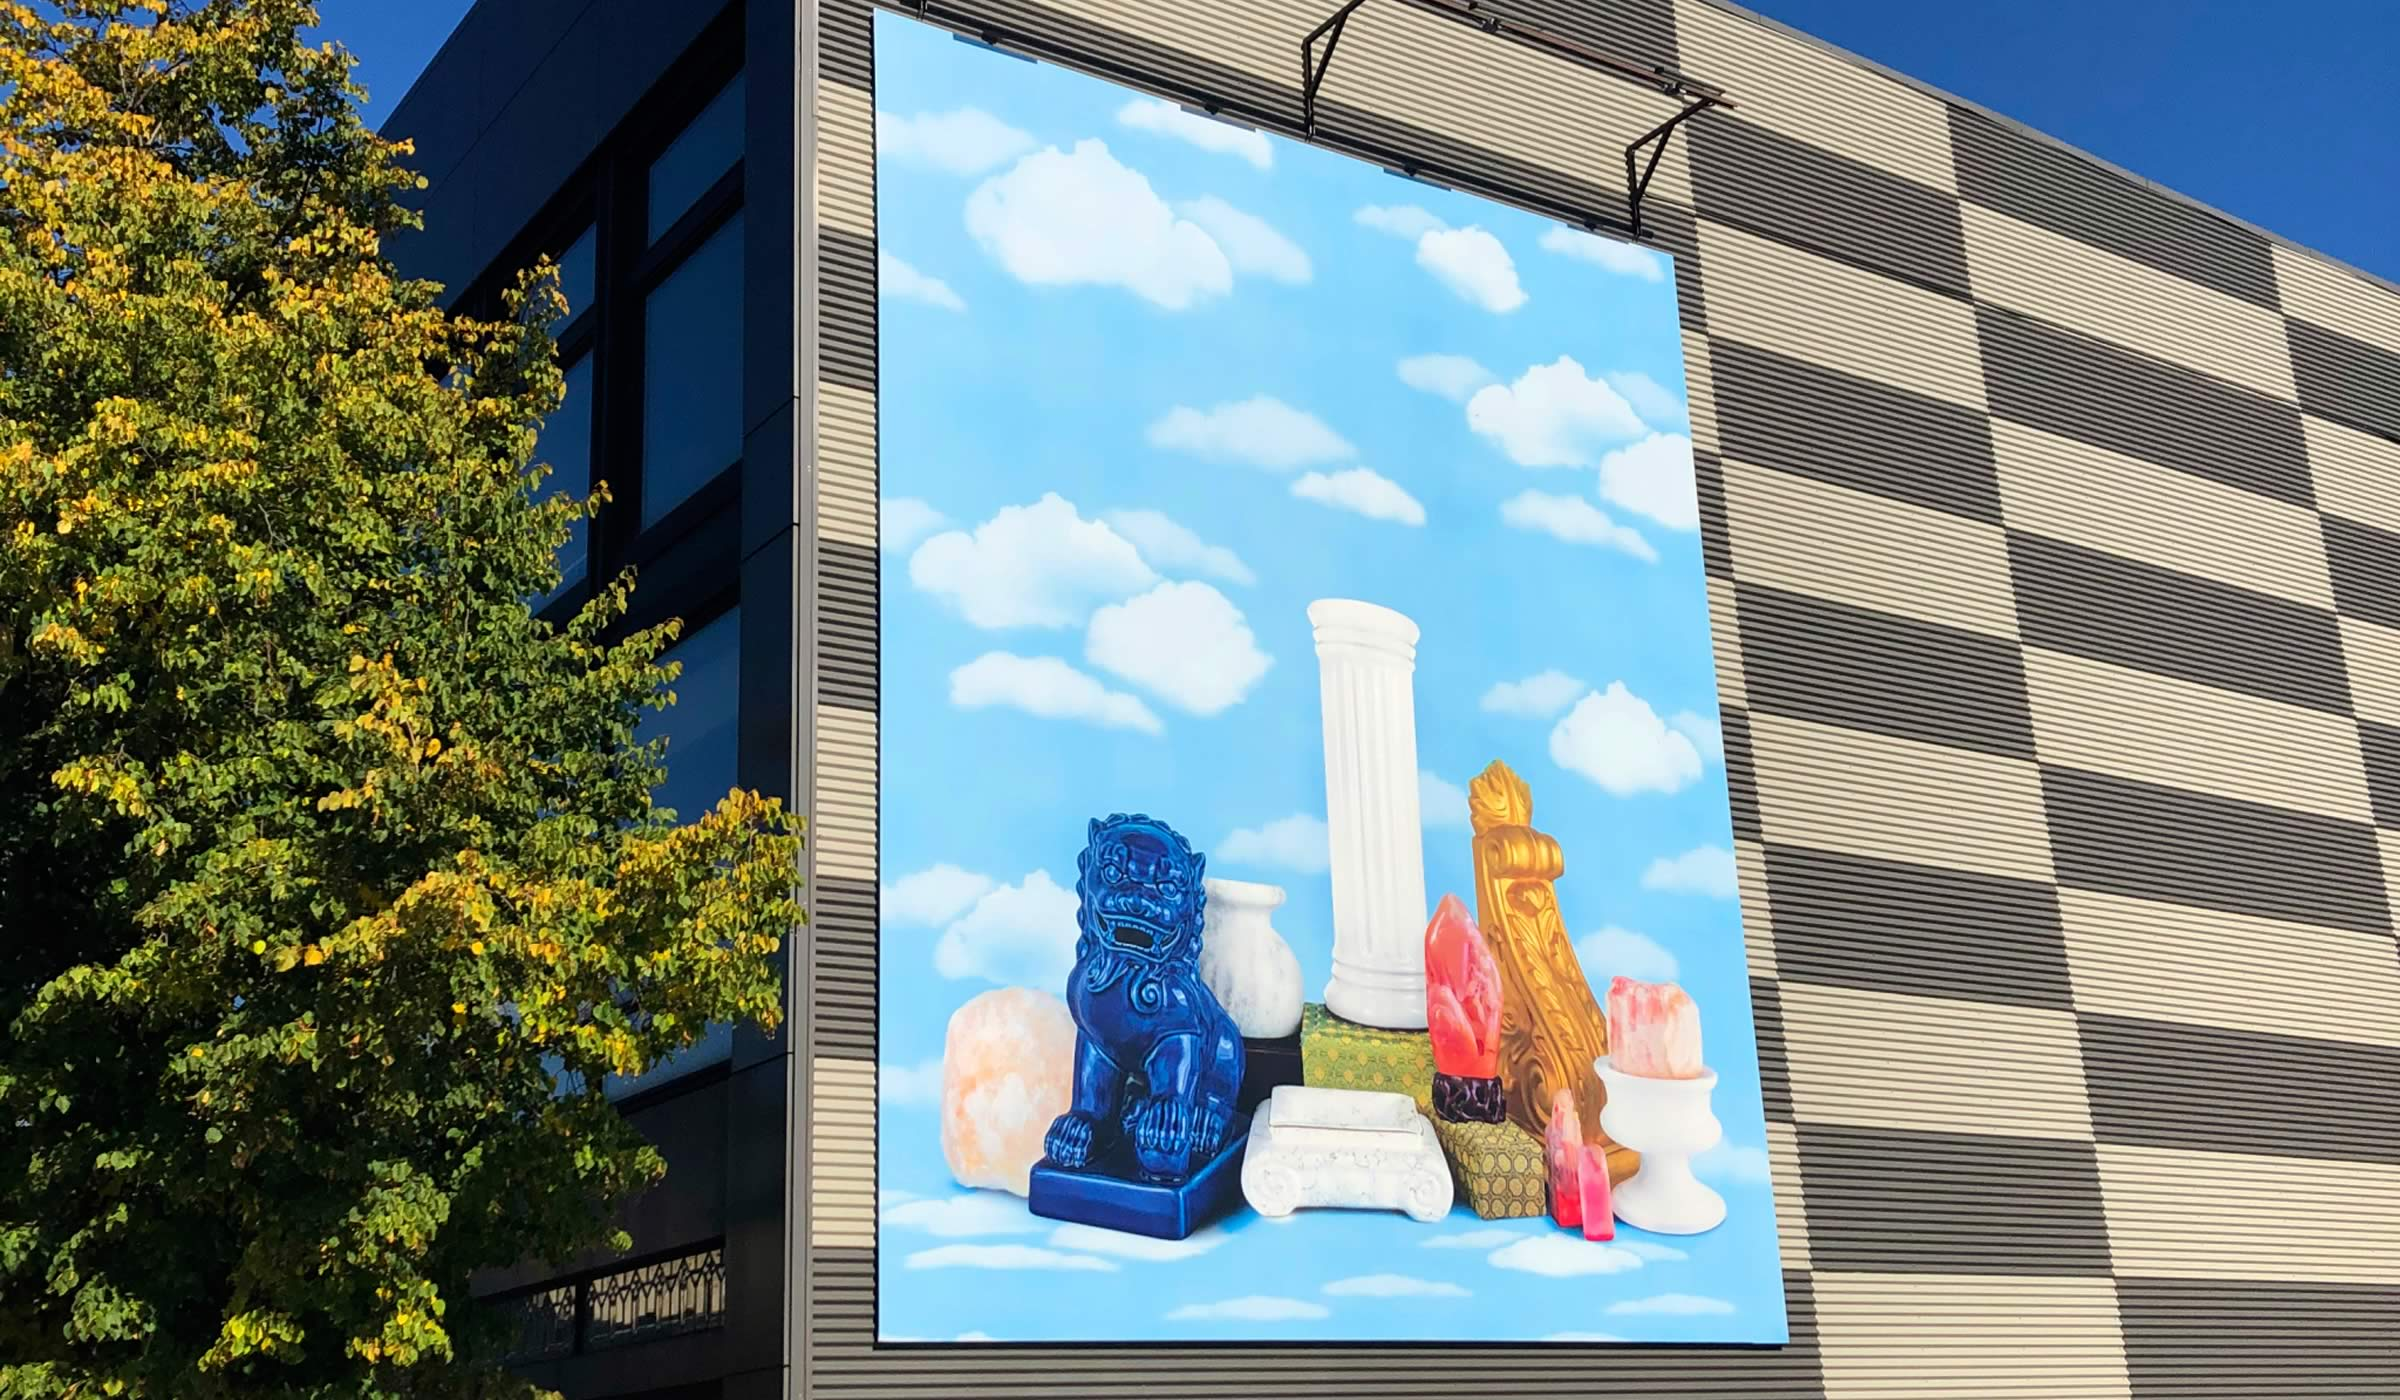 Art mural on Hamilton building